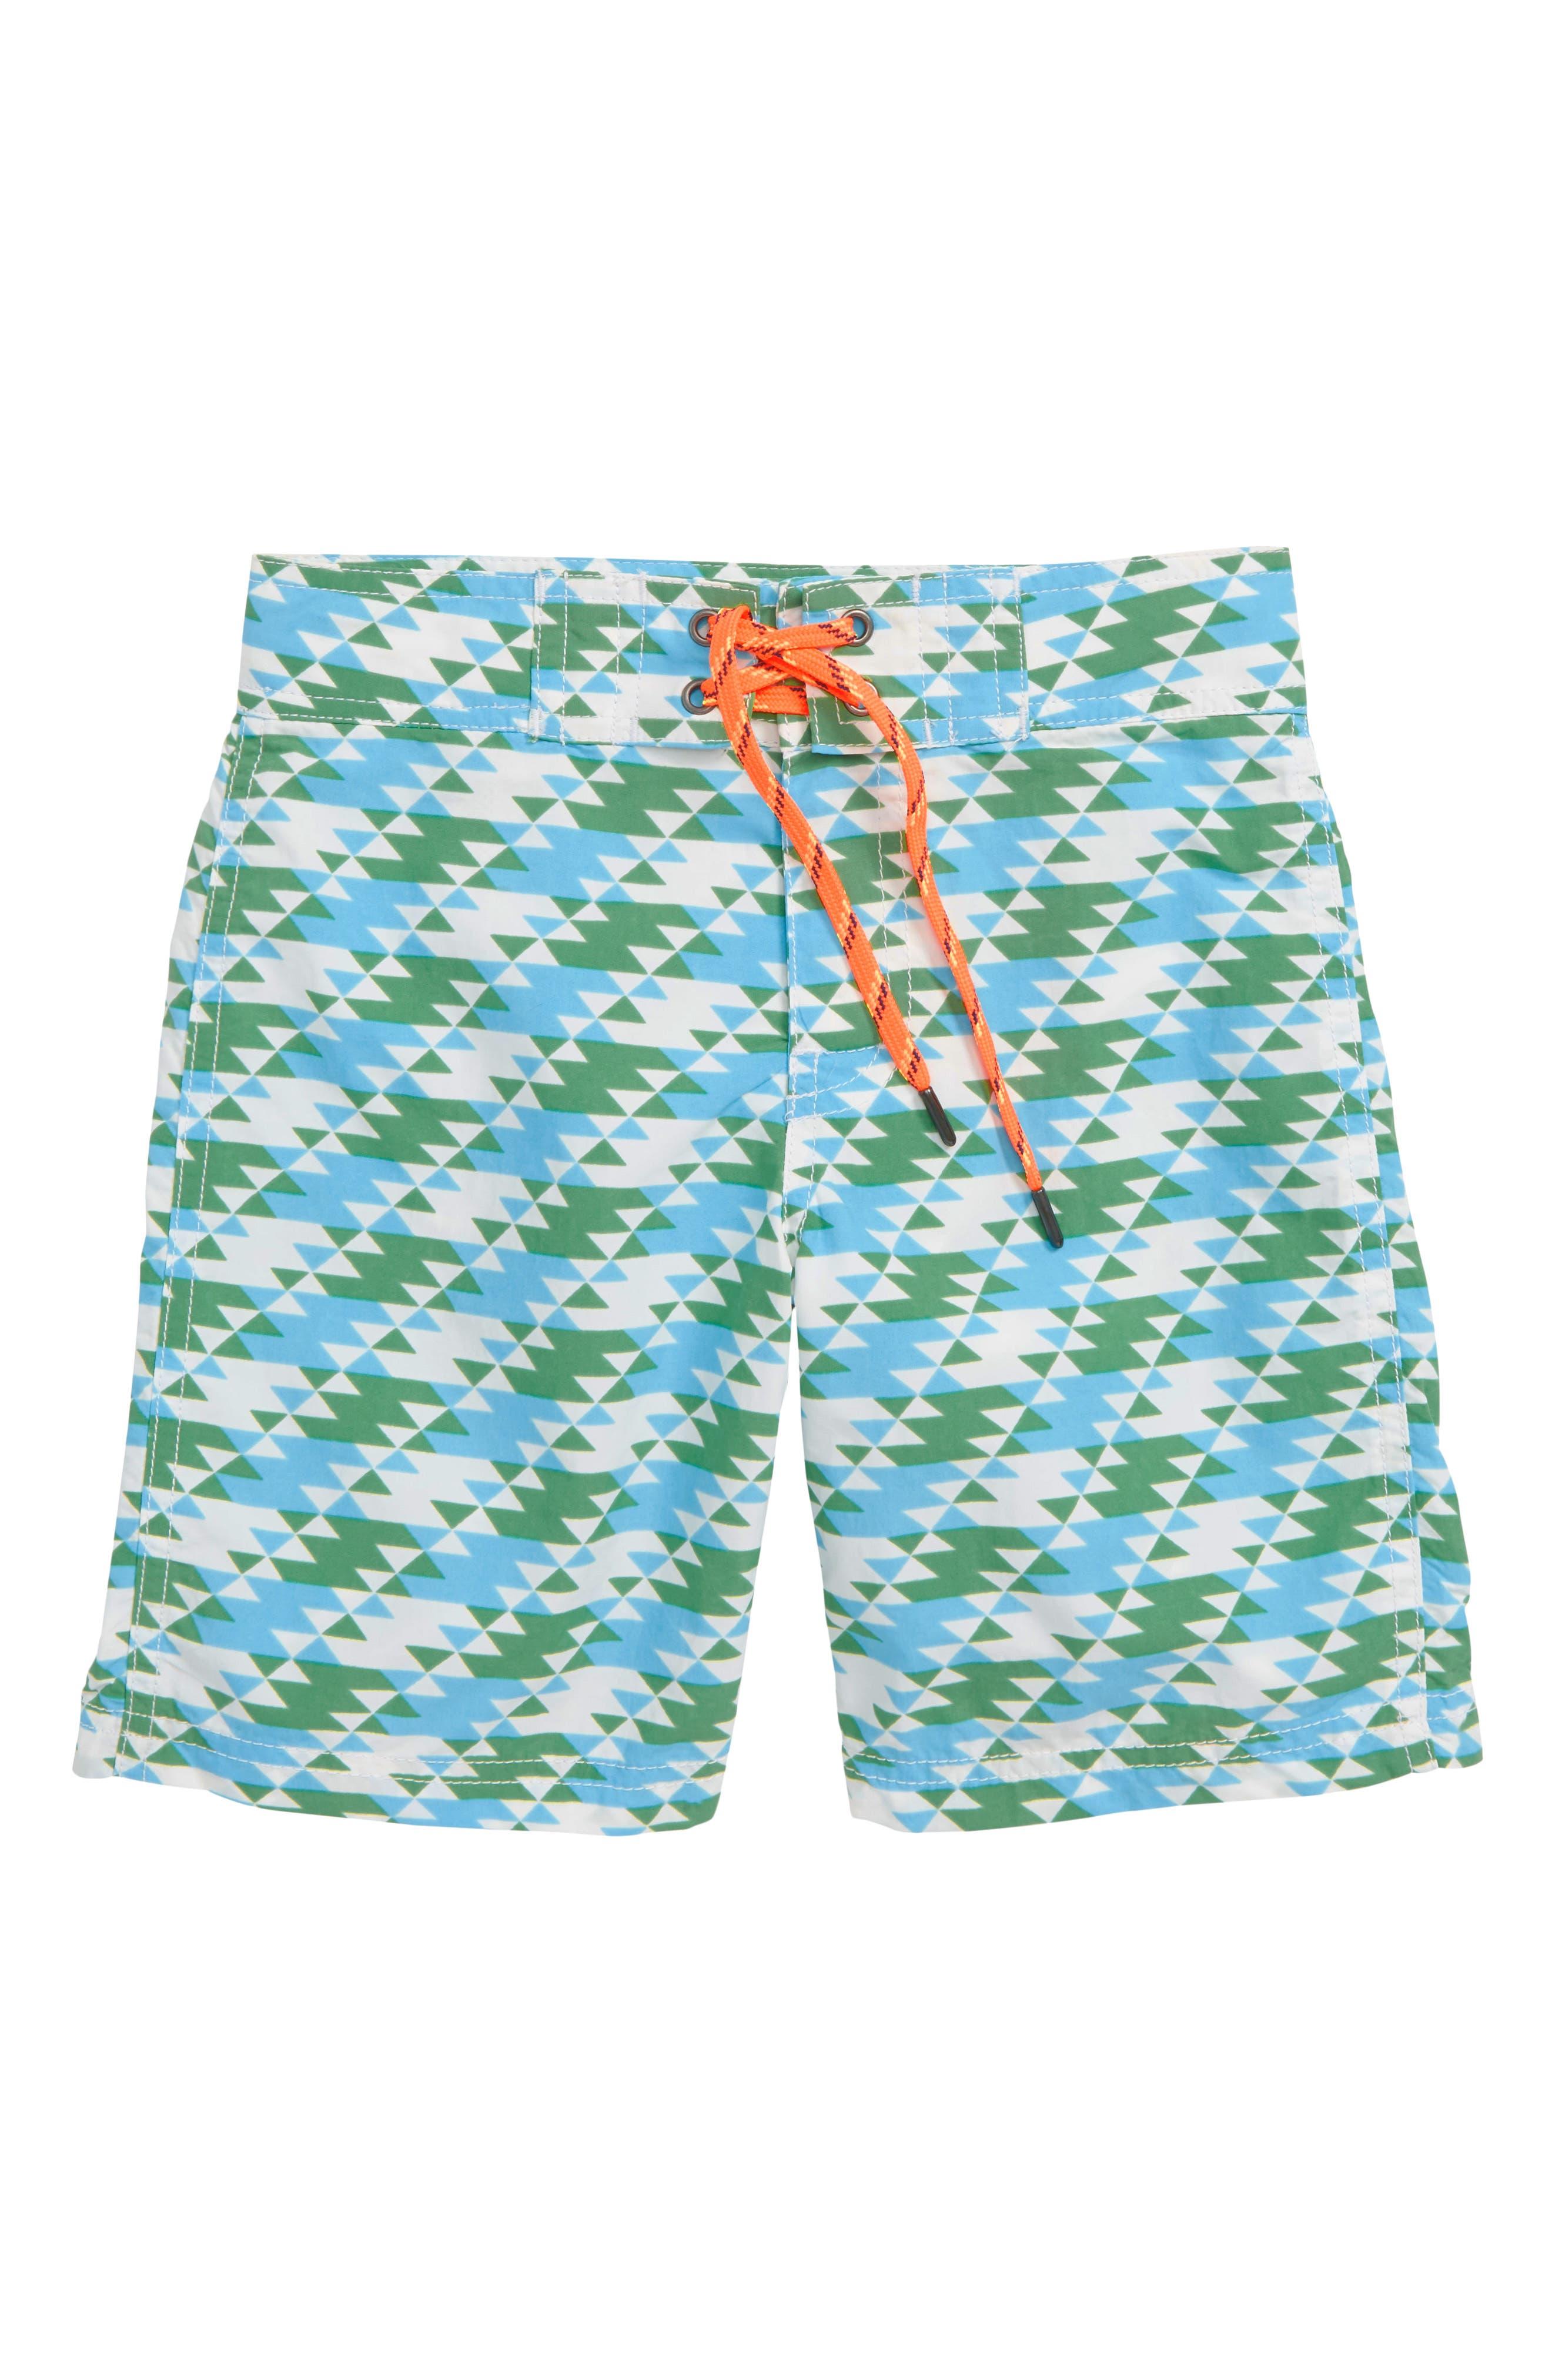 Geo Print Board Shorts, Main, color, IVORY GREEN TEAL